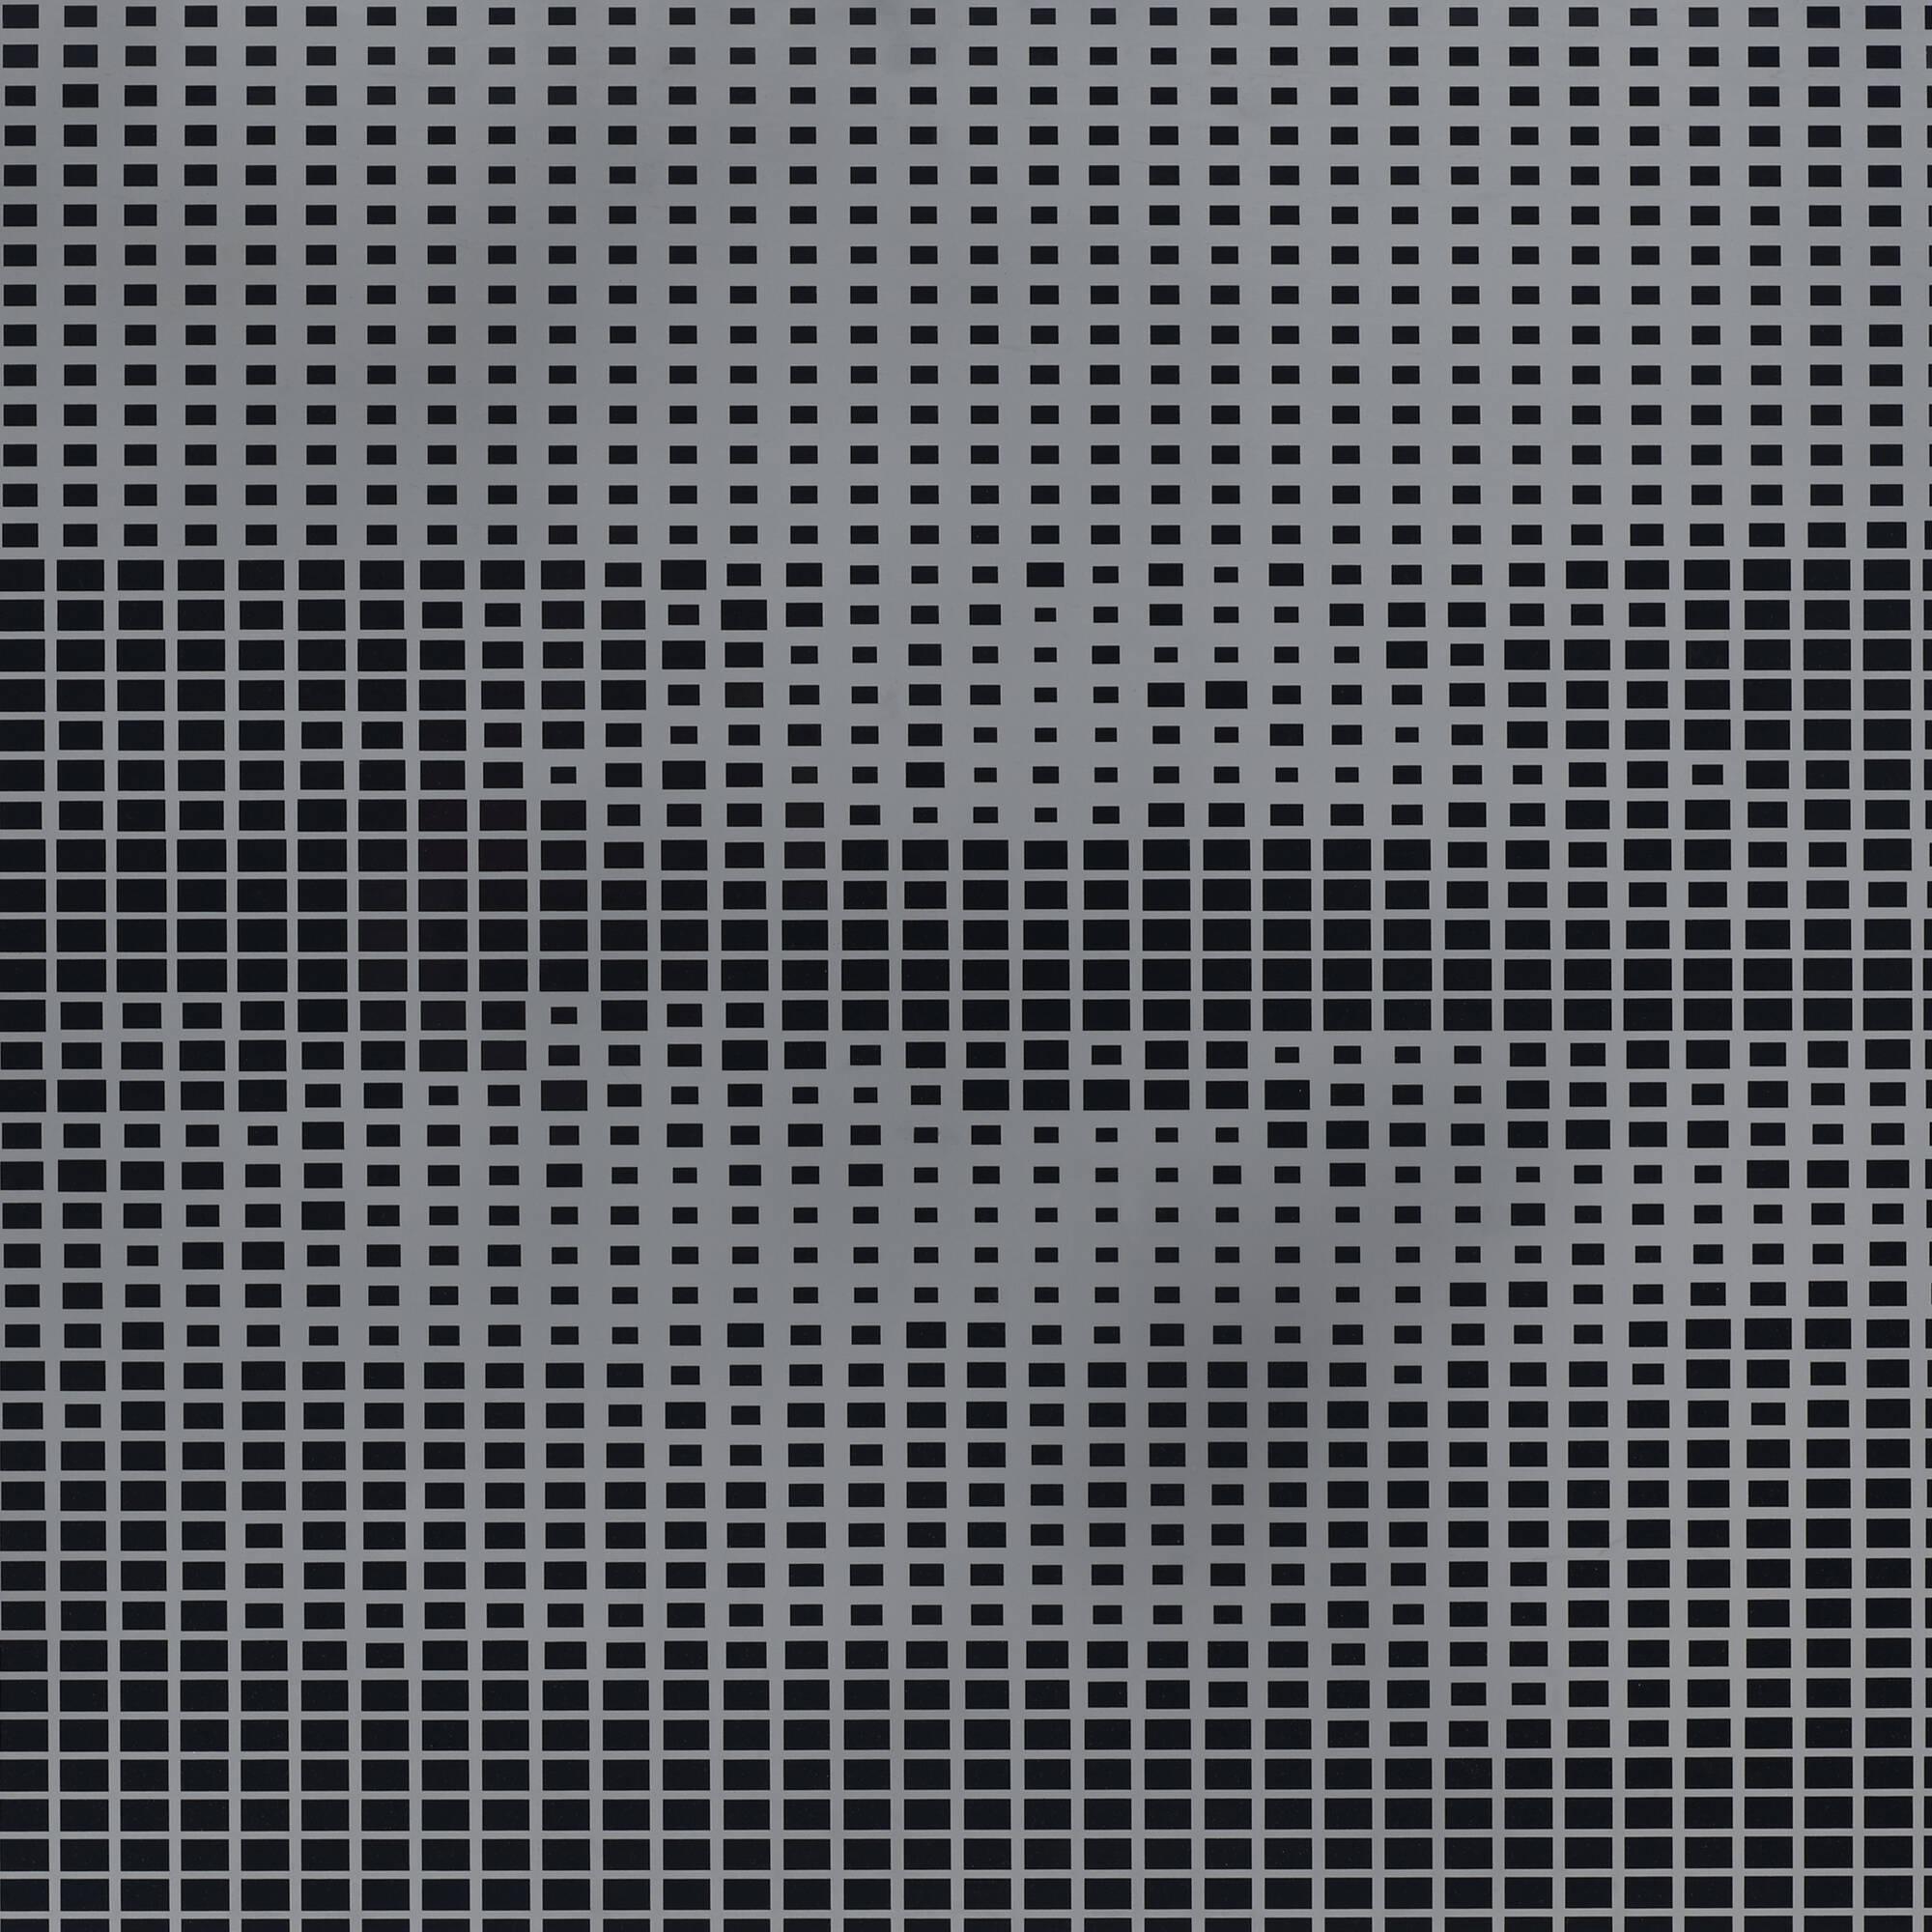 107 Xavier Veilhan Ghost Landscape Series 02 No 37 Art